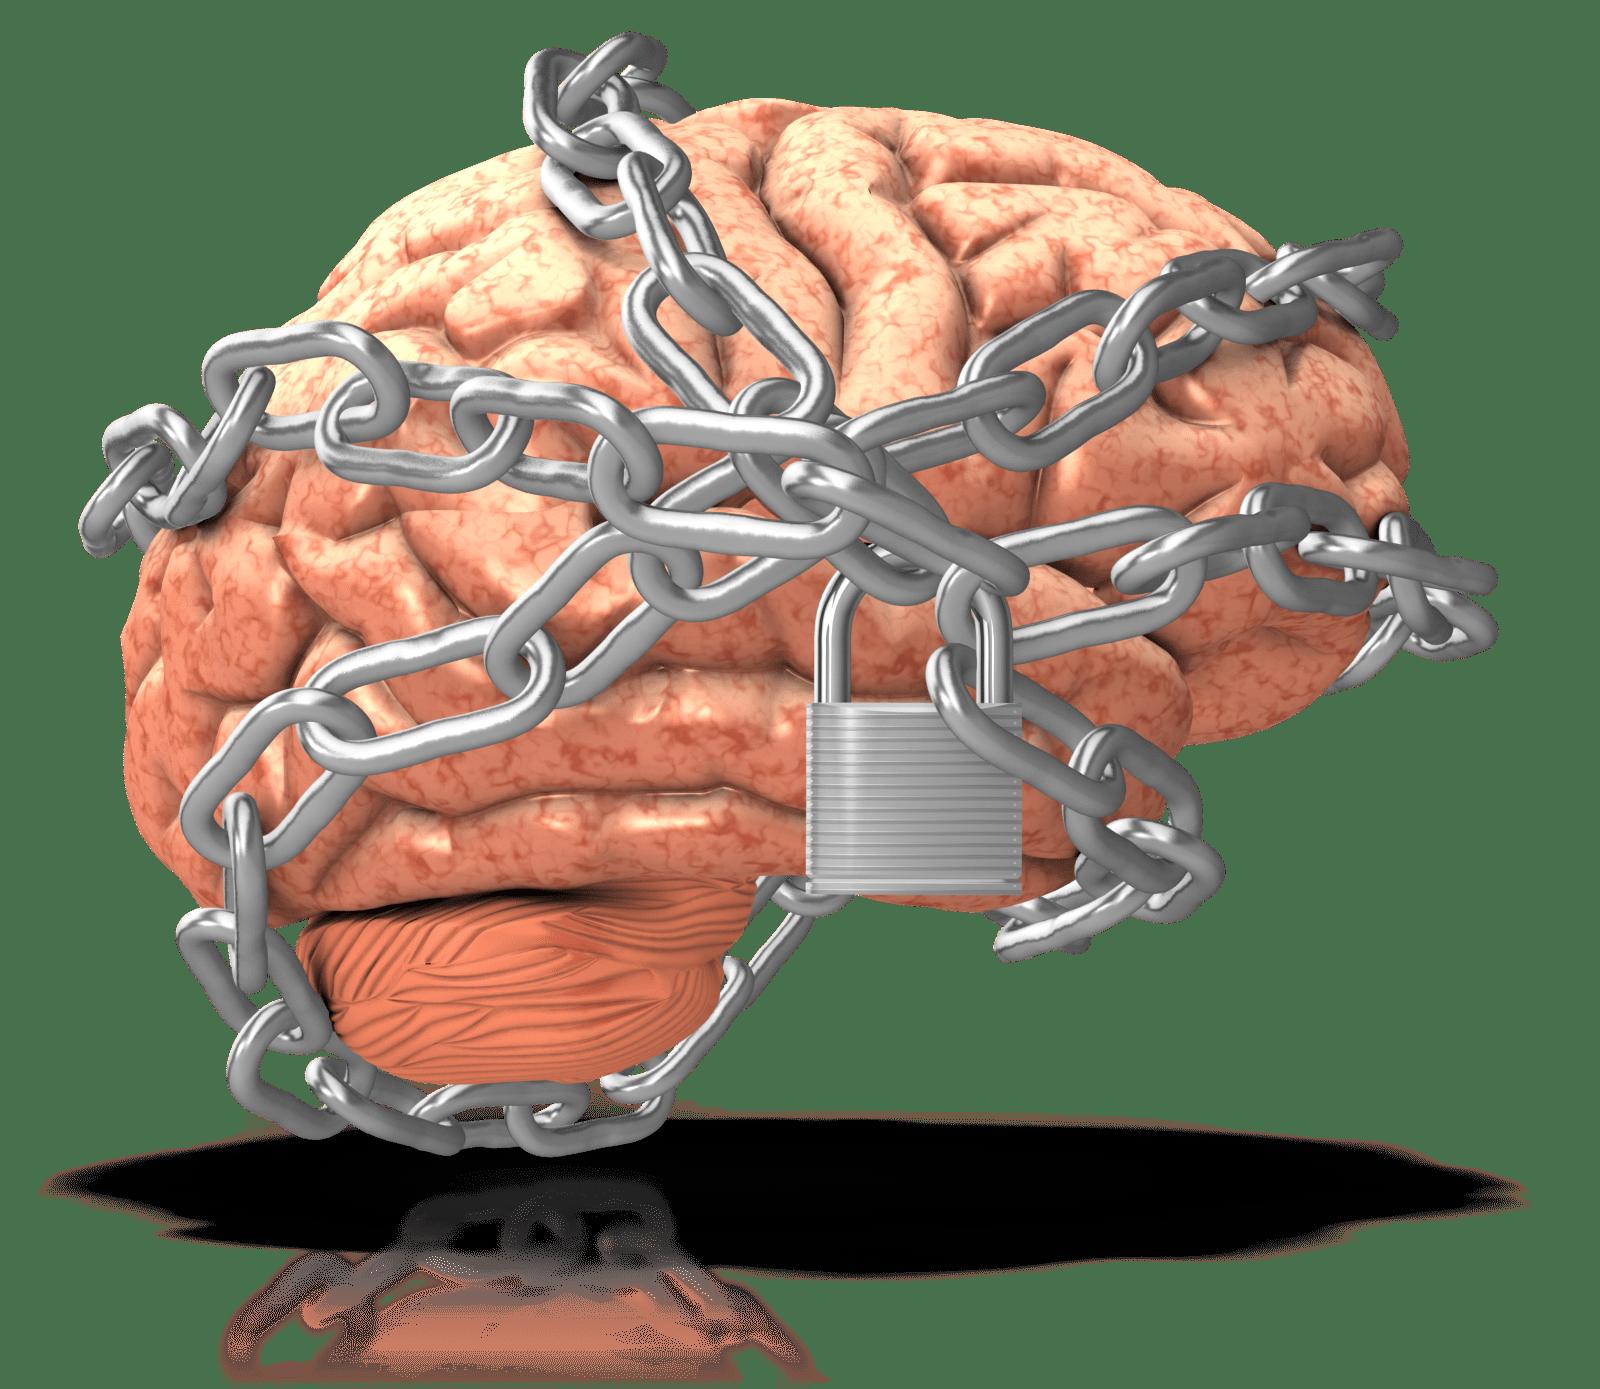 brain_locked_up_1600_clr_10112